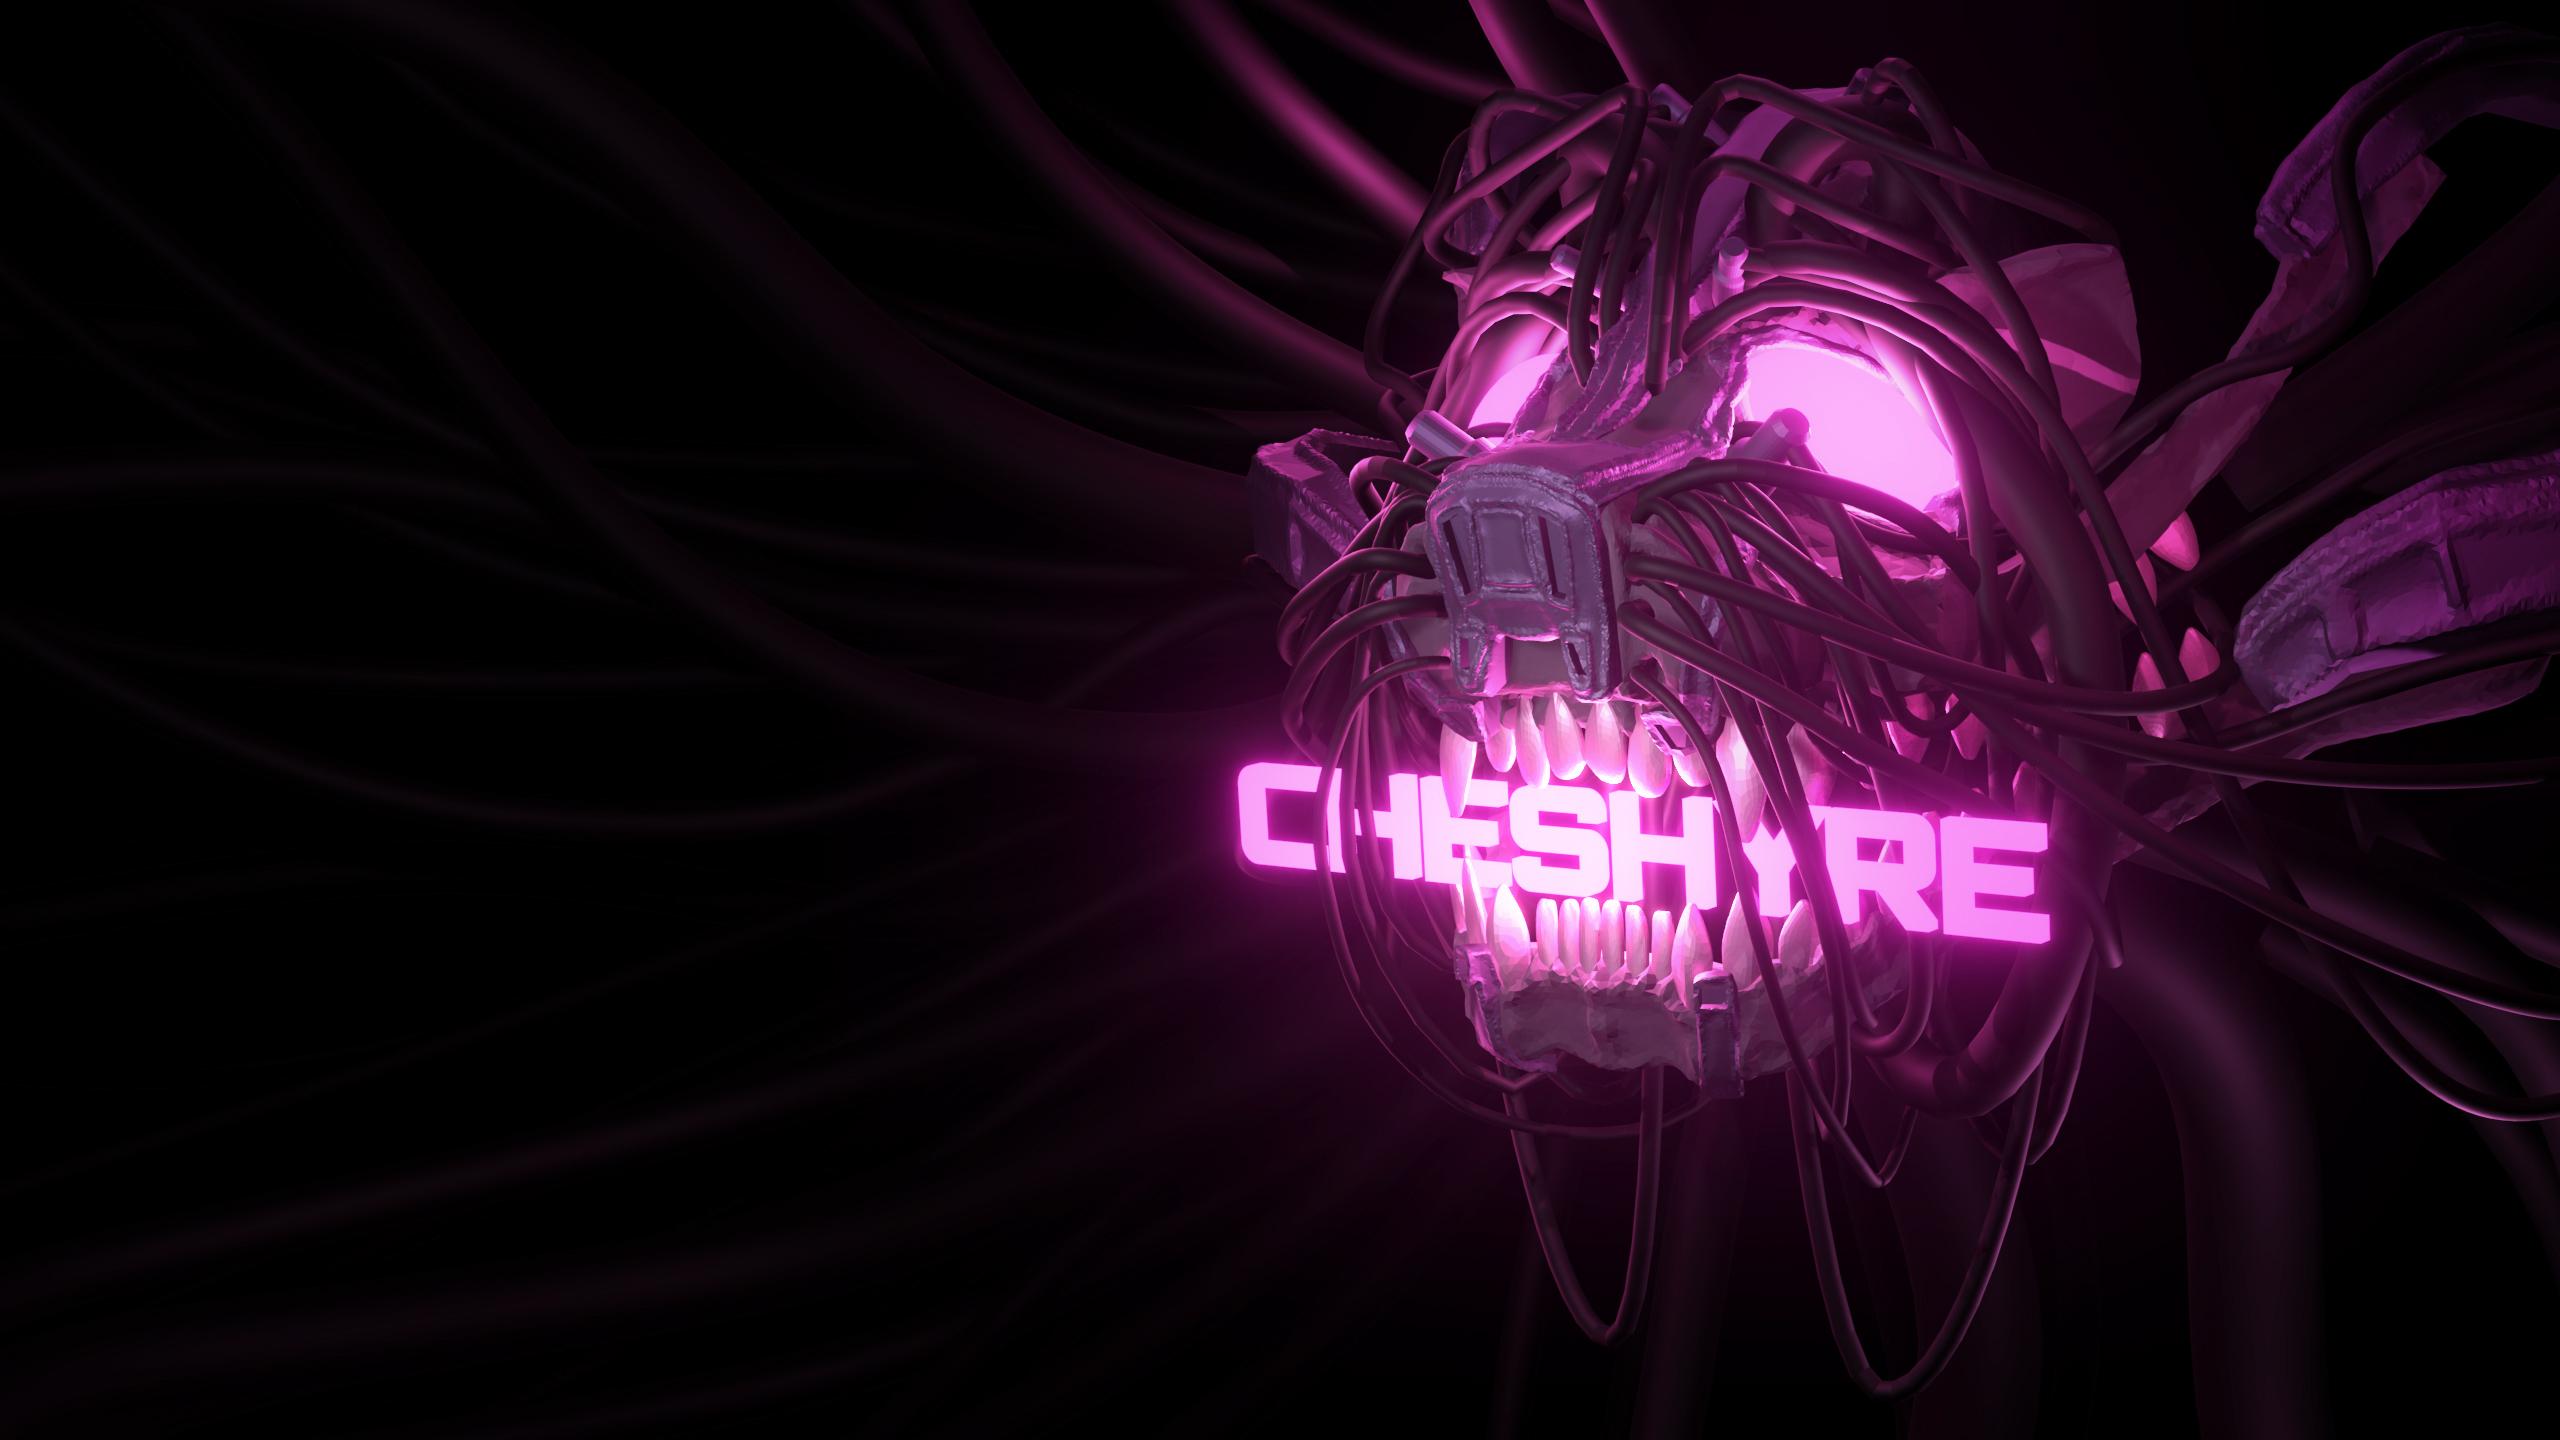 Cheshyre - Megabeast